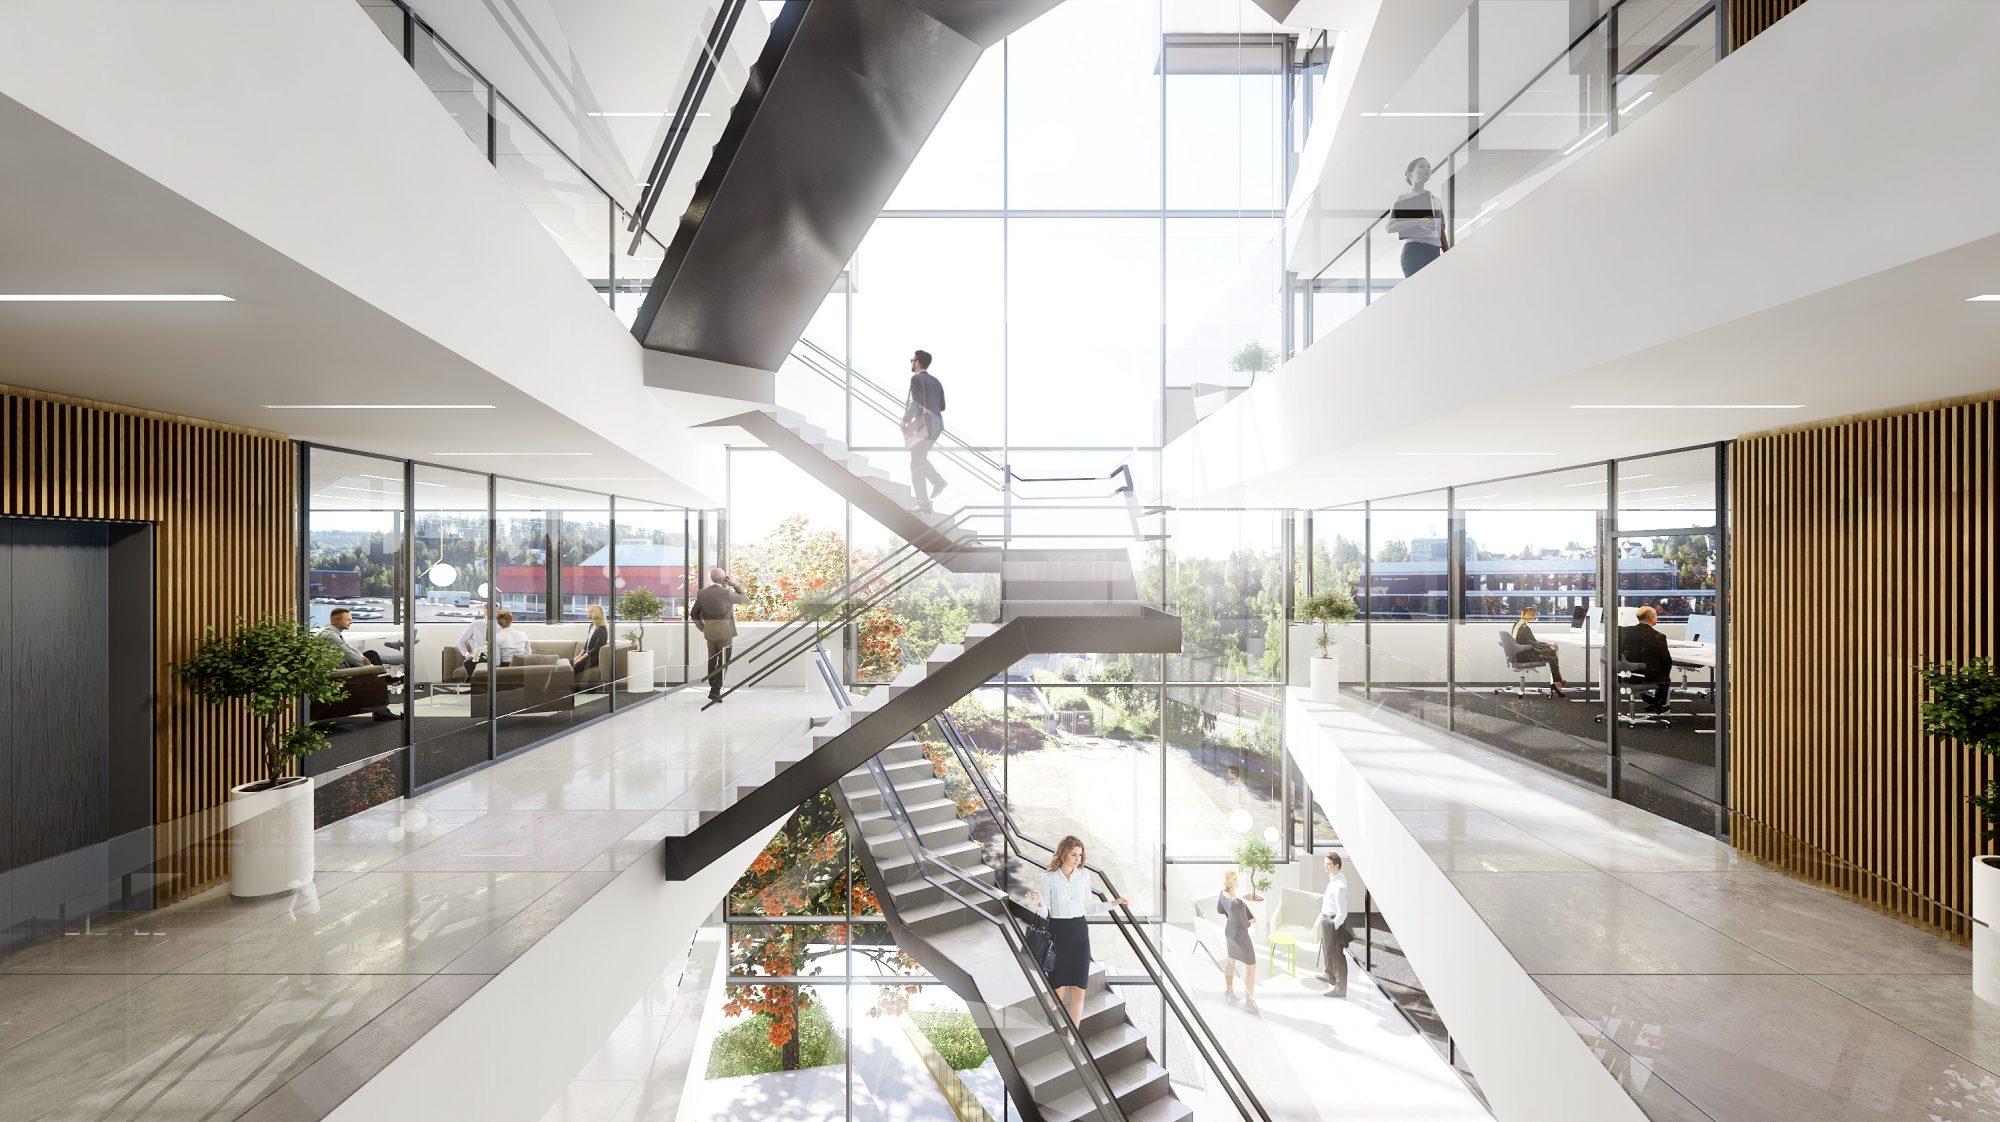 Eskalator Trapp og atrium